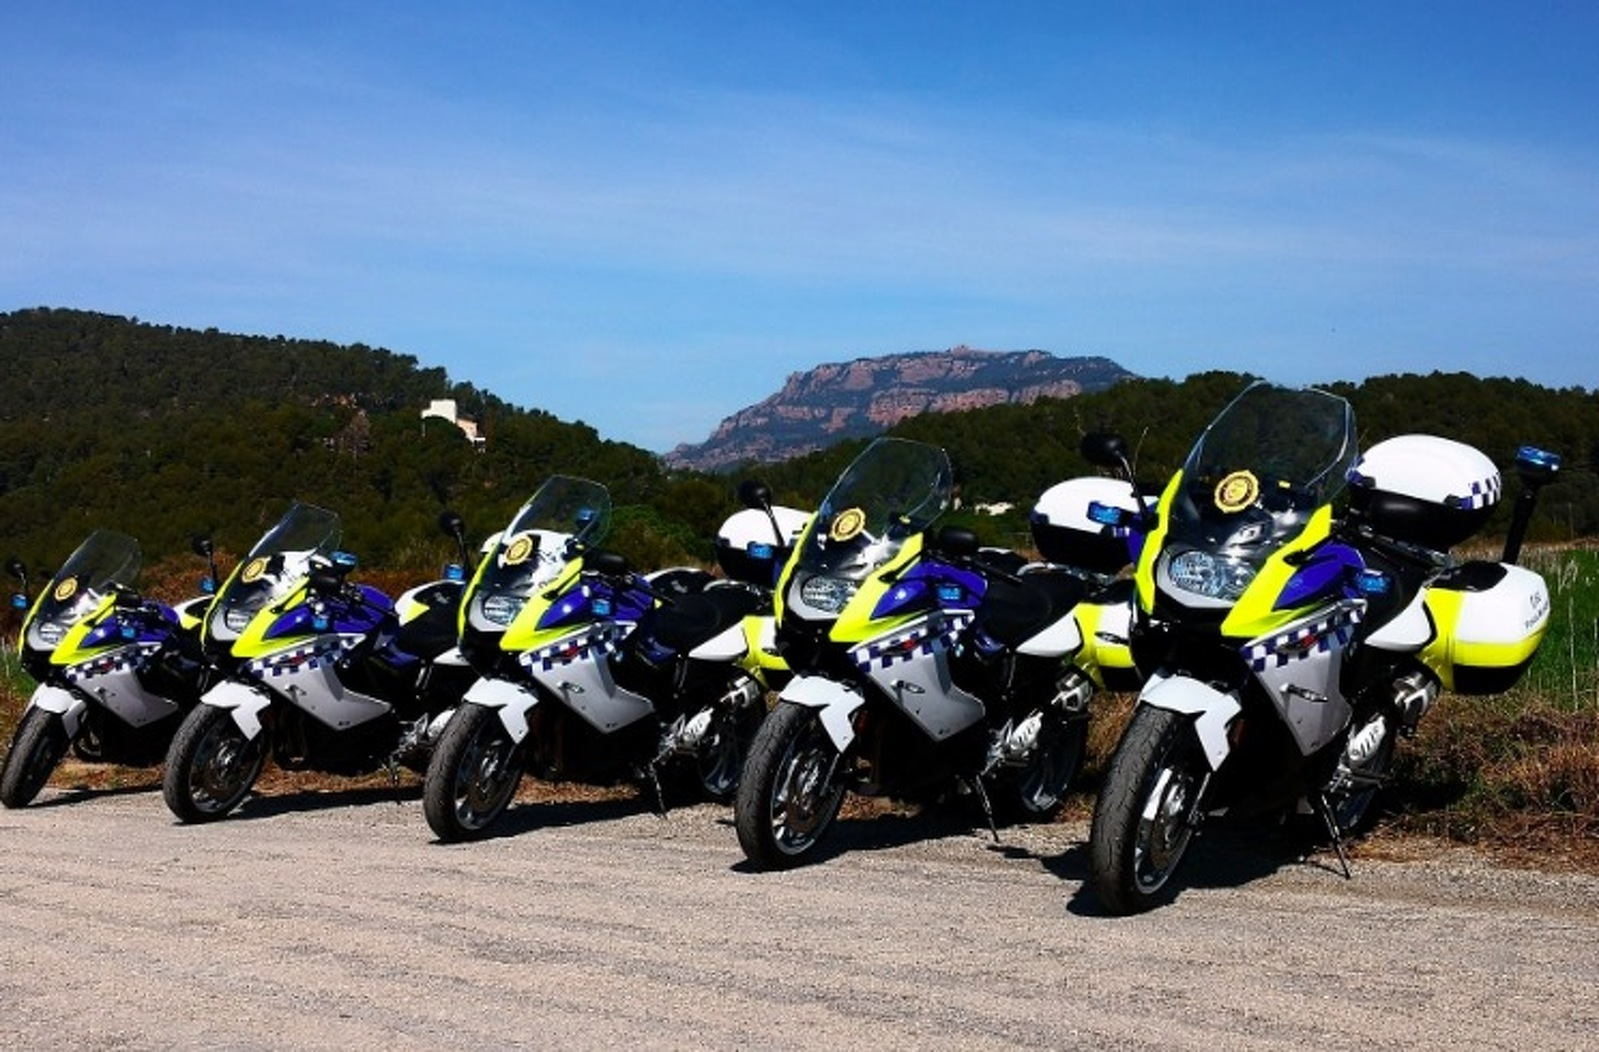 Motos de la policia municipal de Terrassa